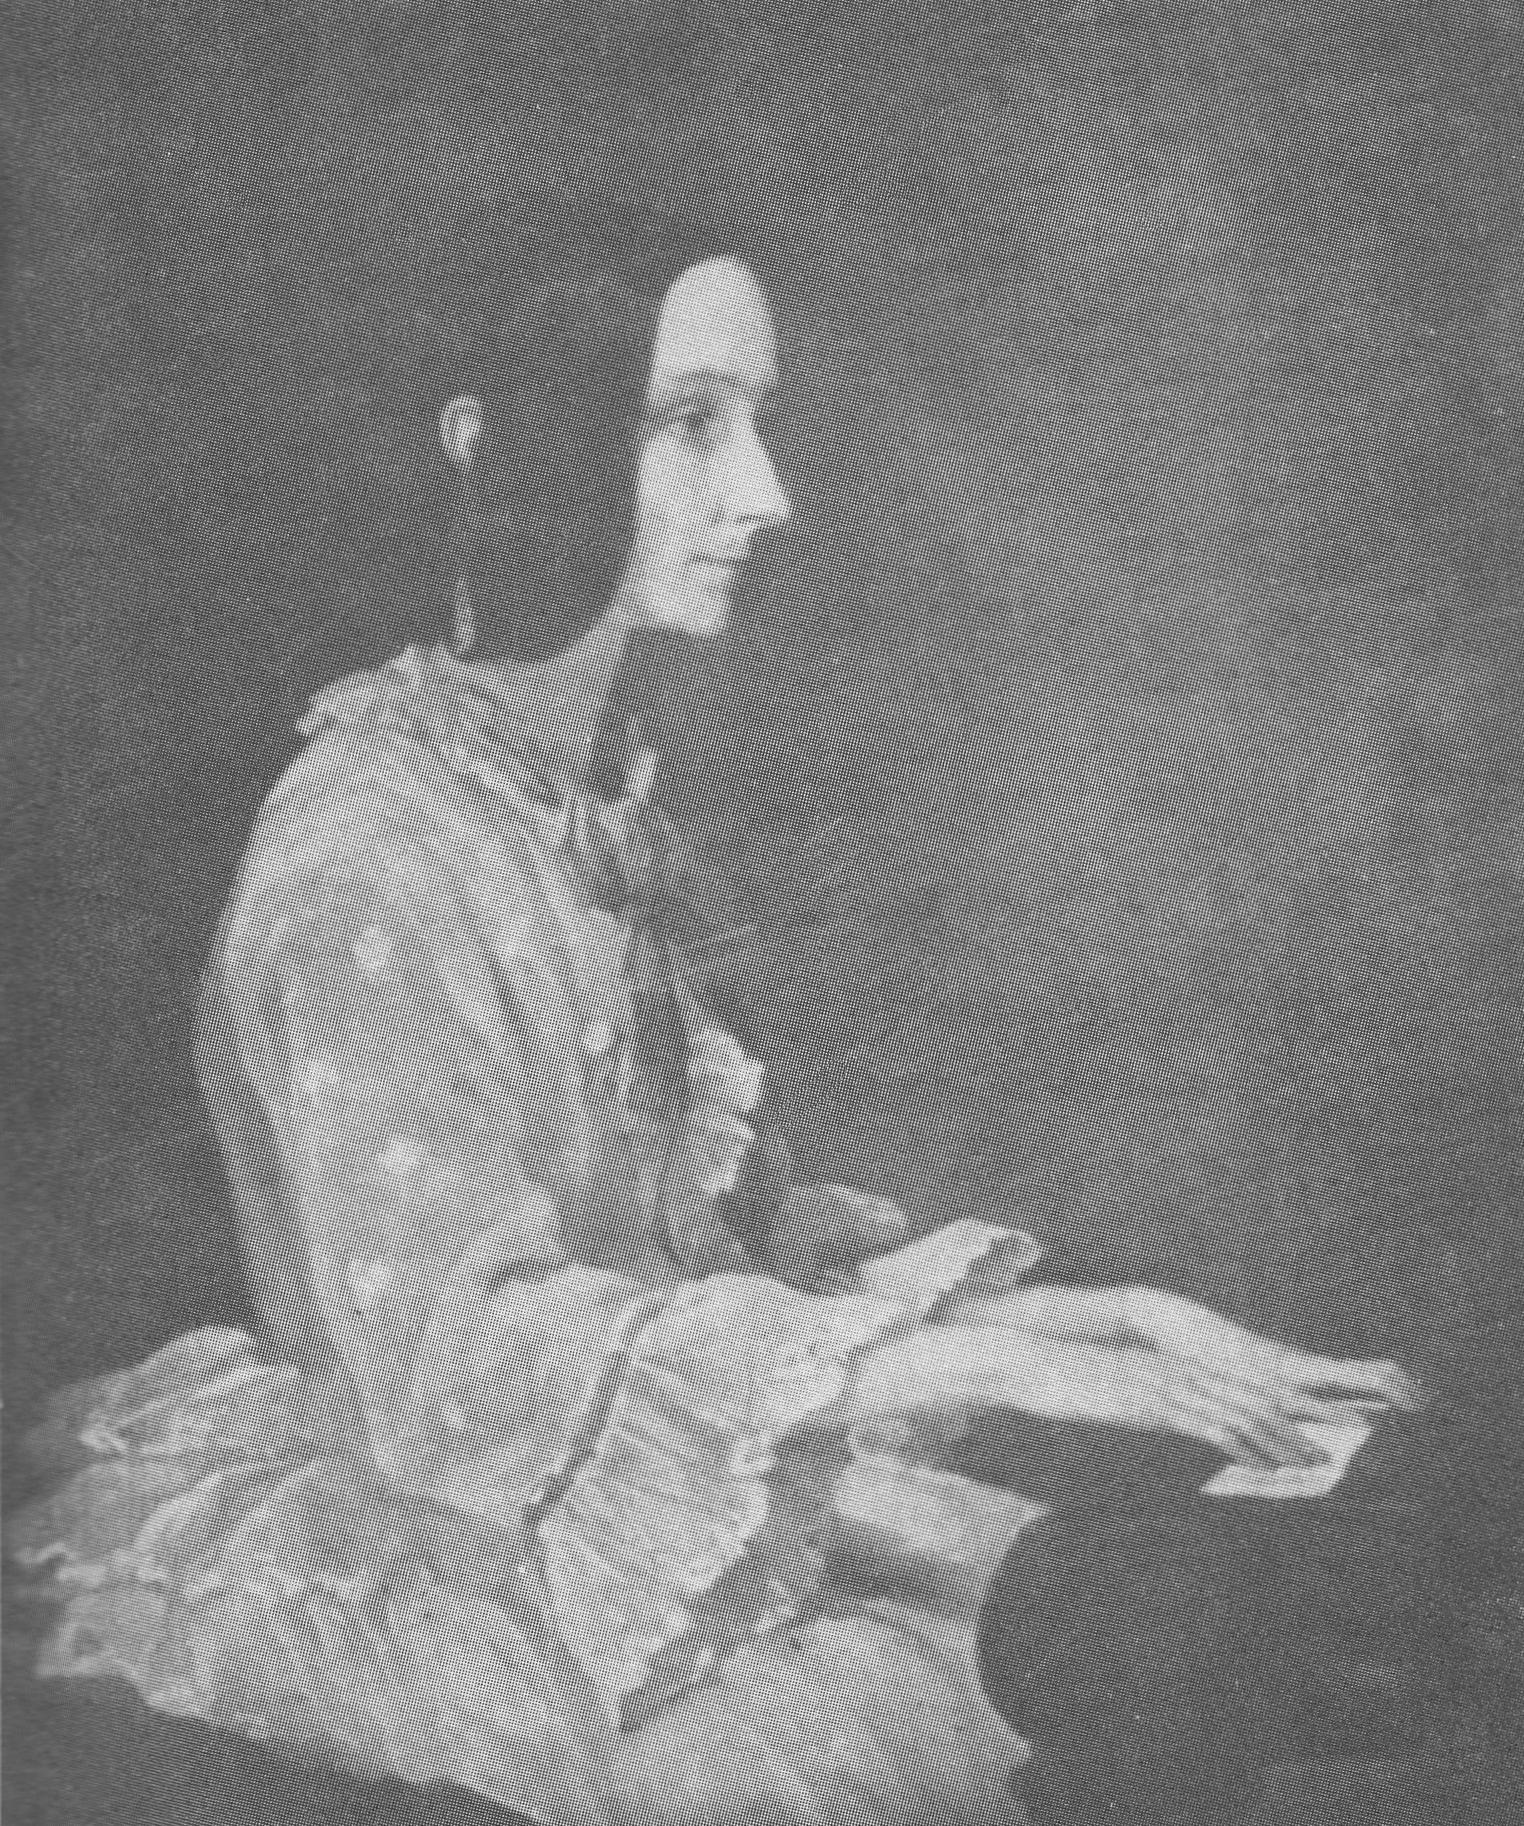 https://i0.wp.com/www.gogmsite.net/_Media/1852-ada-lovelace-at-a-3.jpeg